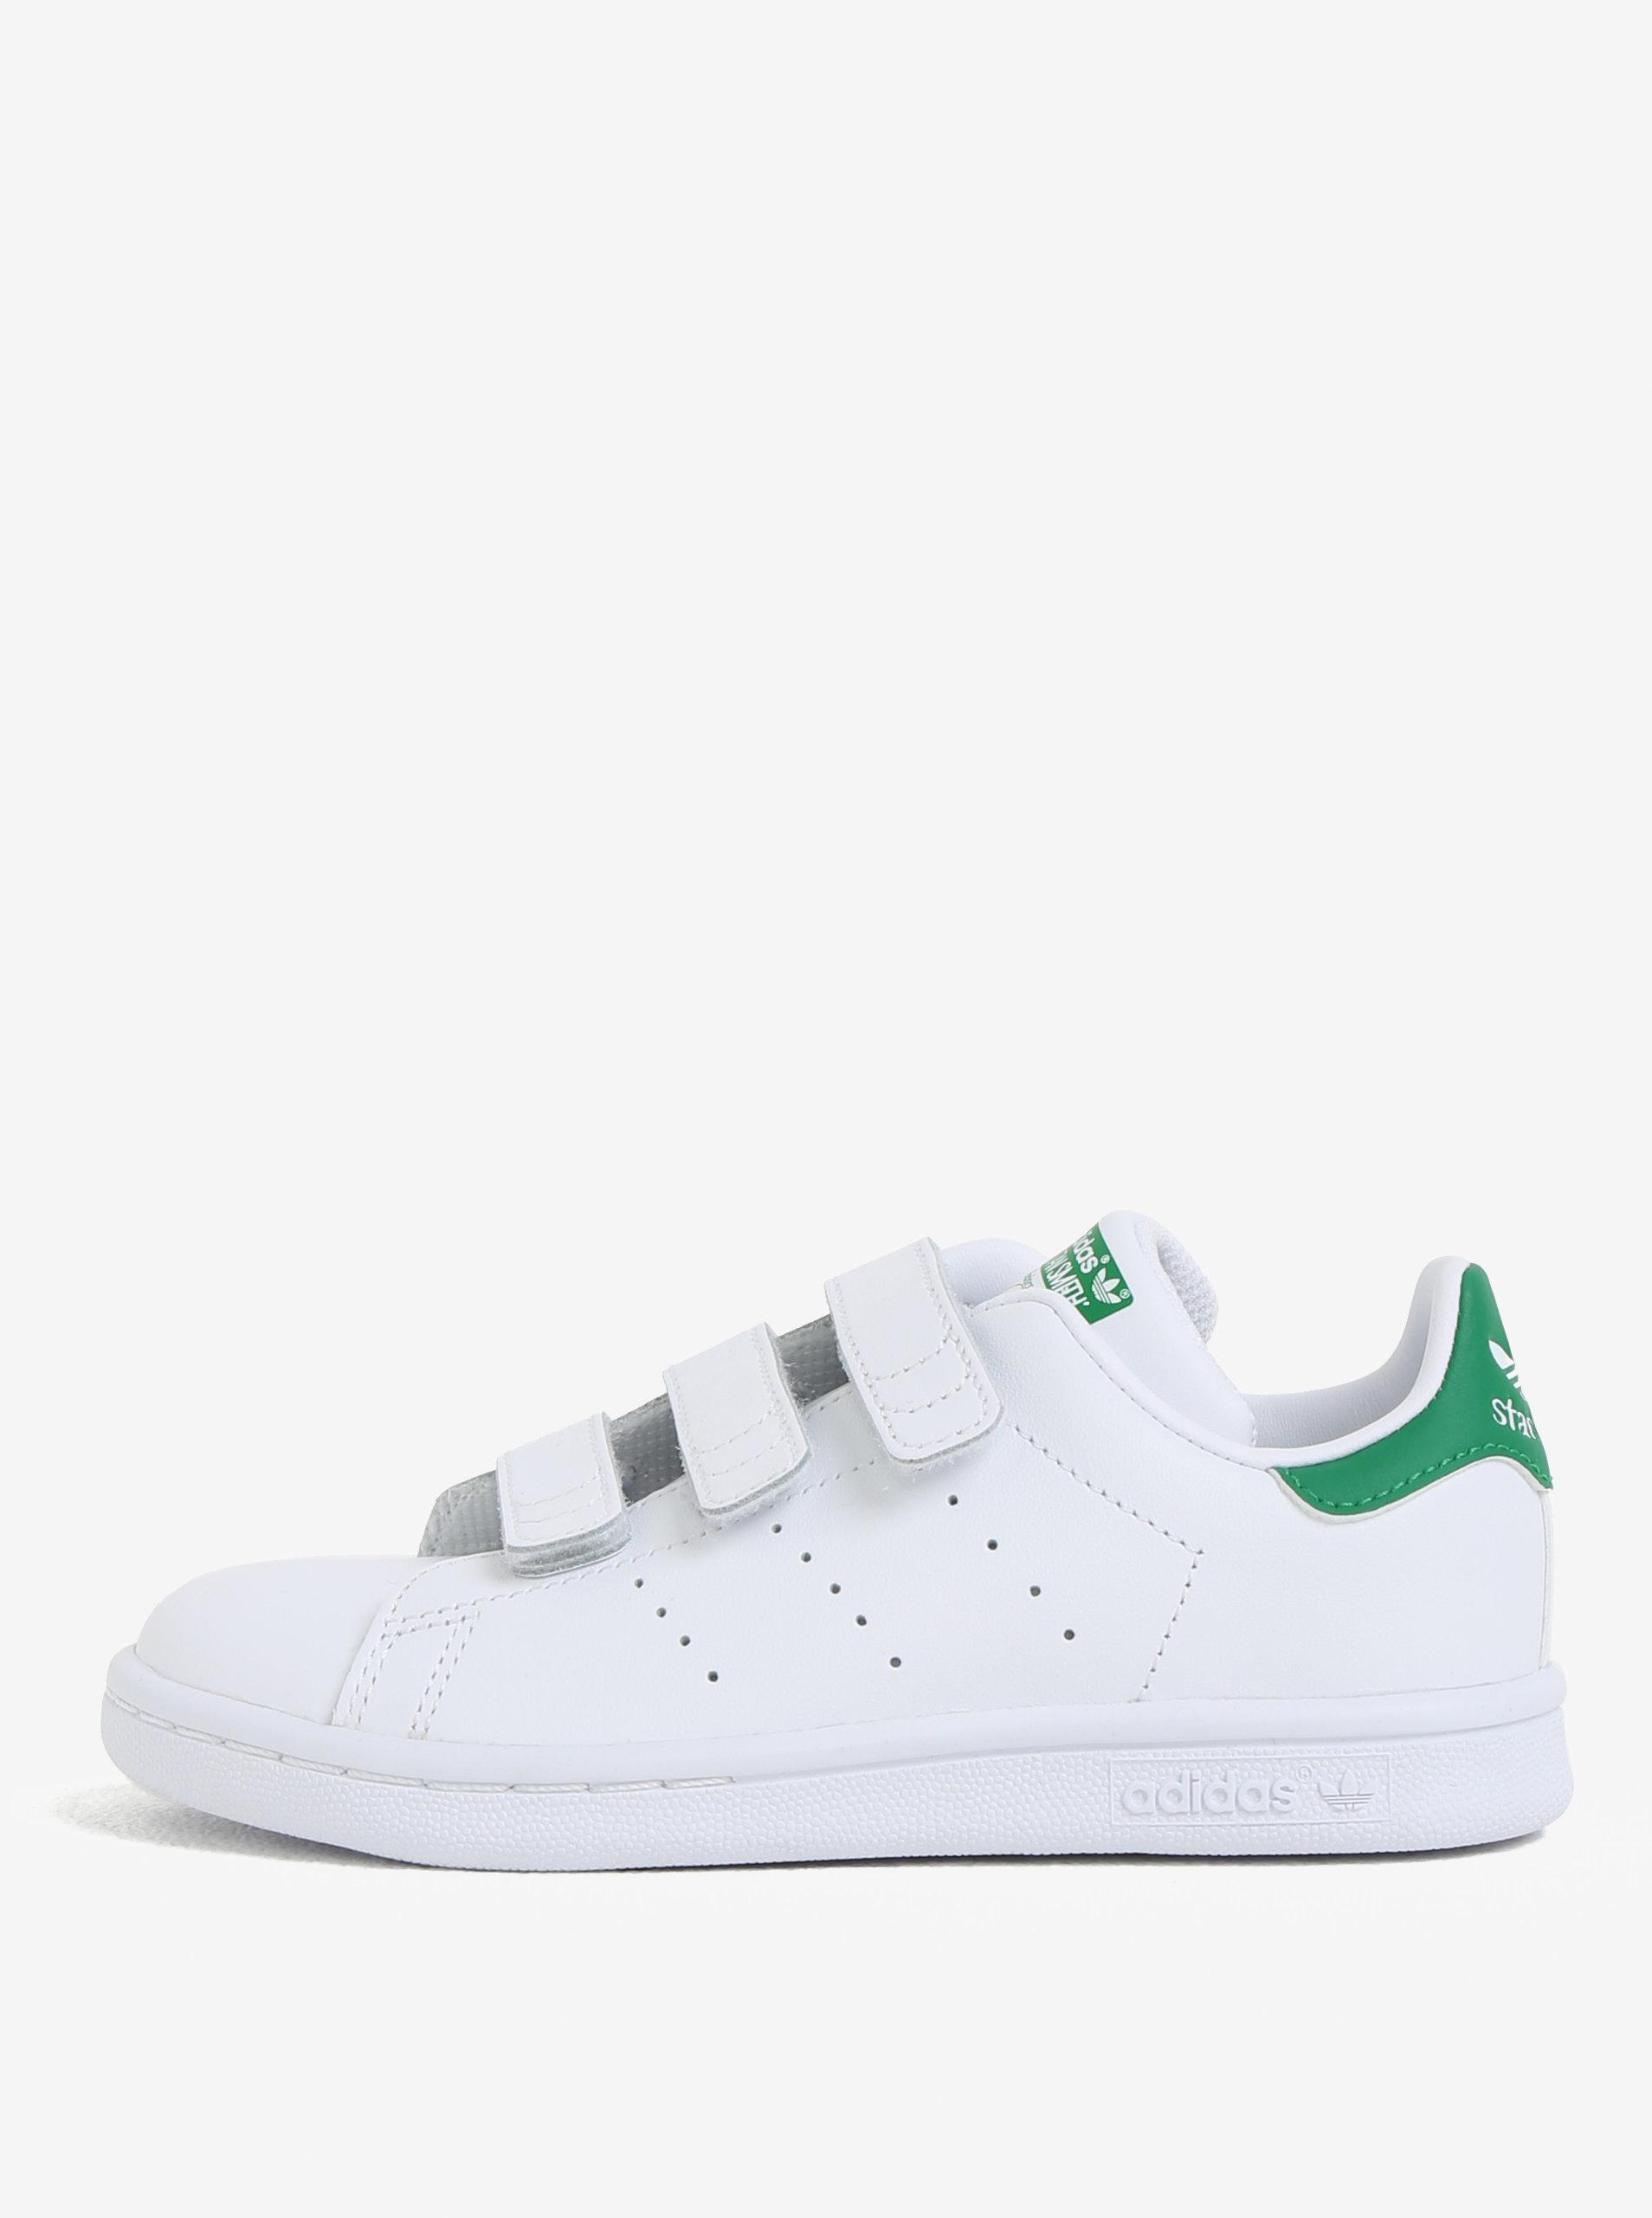 e9cc77c94f0 Biele detské kožené tenisky na suchý zips adidas Originals Stan Smith Cf C  ...